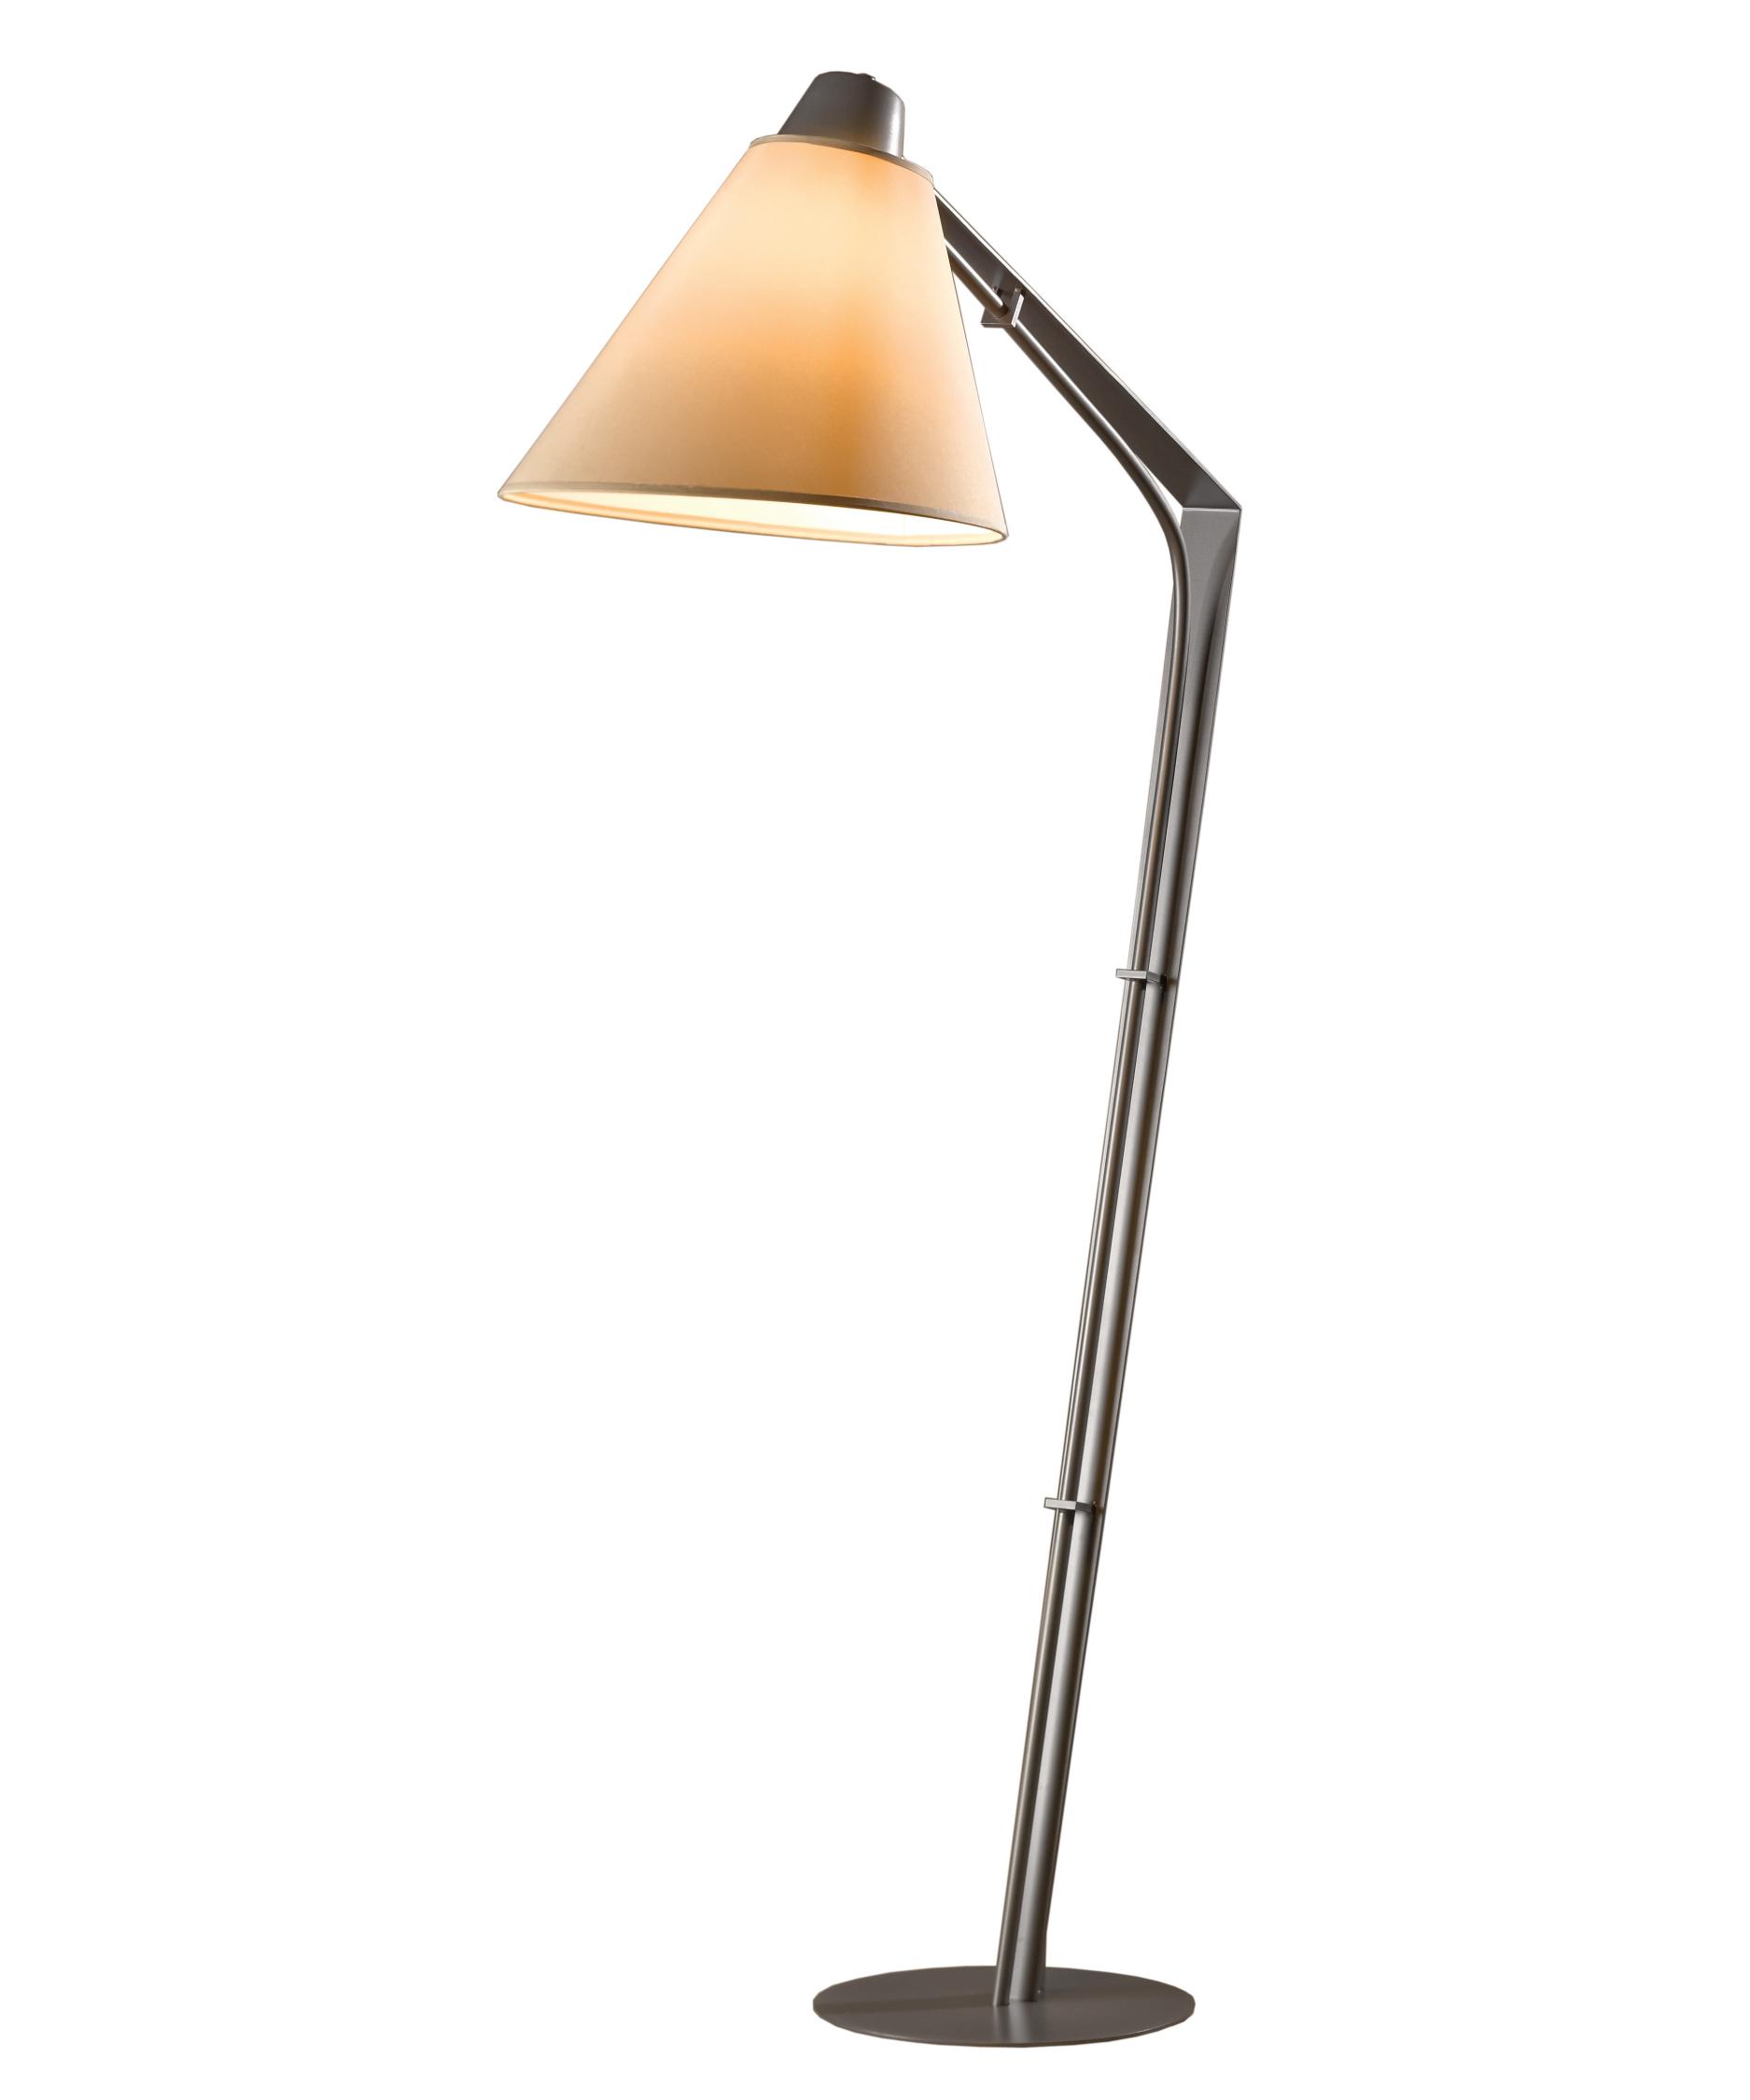 Reading Floor Lamps Adjustable 10 Tips For Choosing